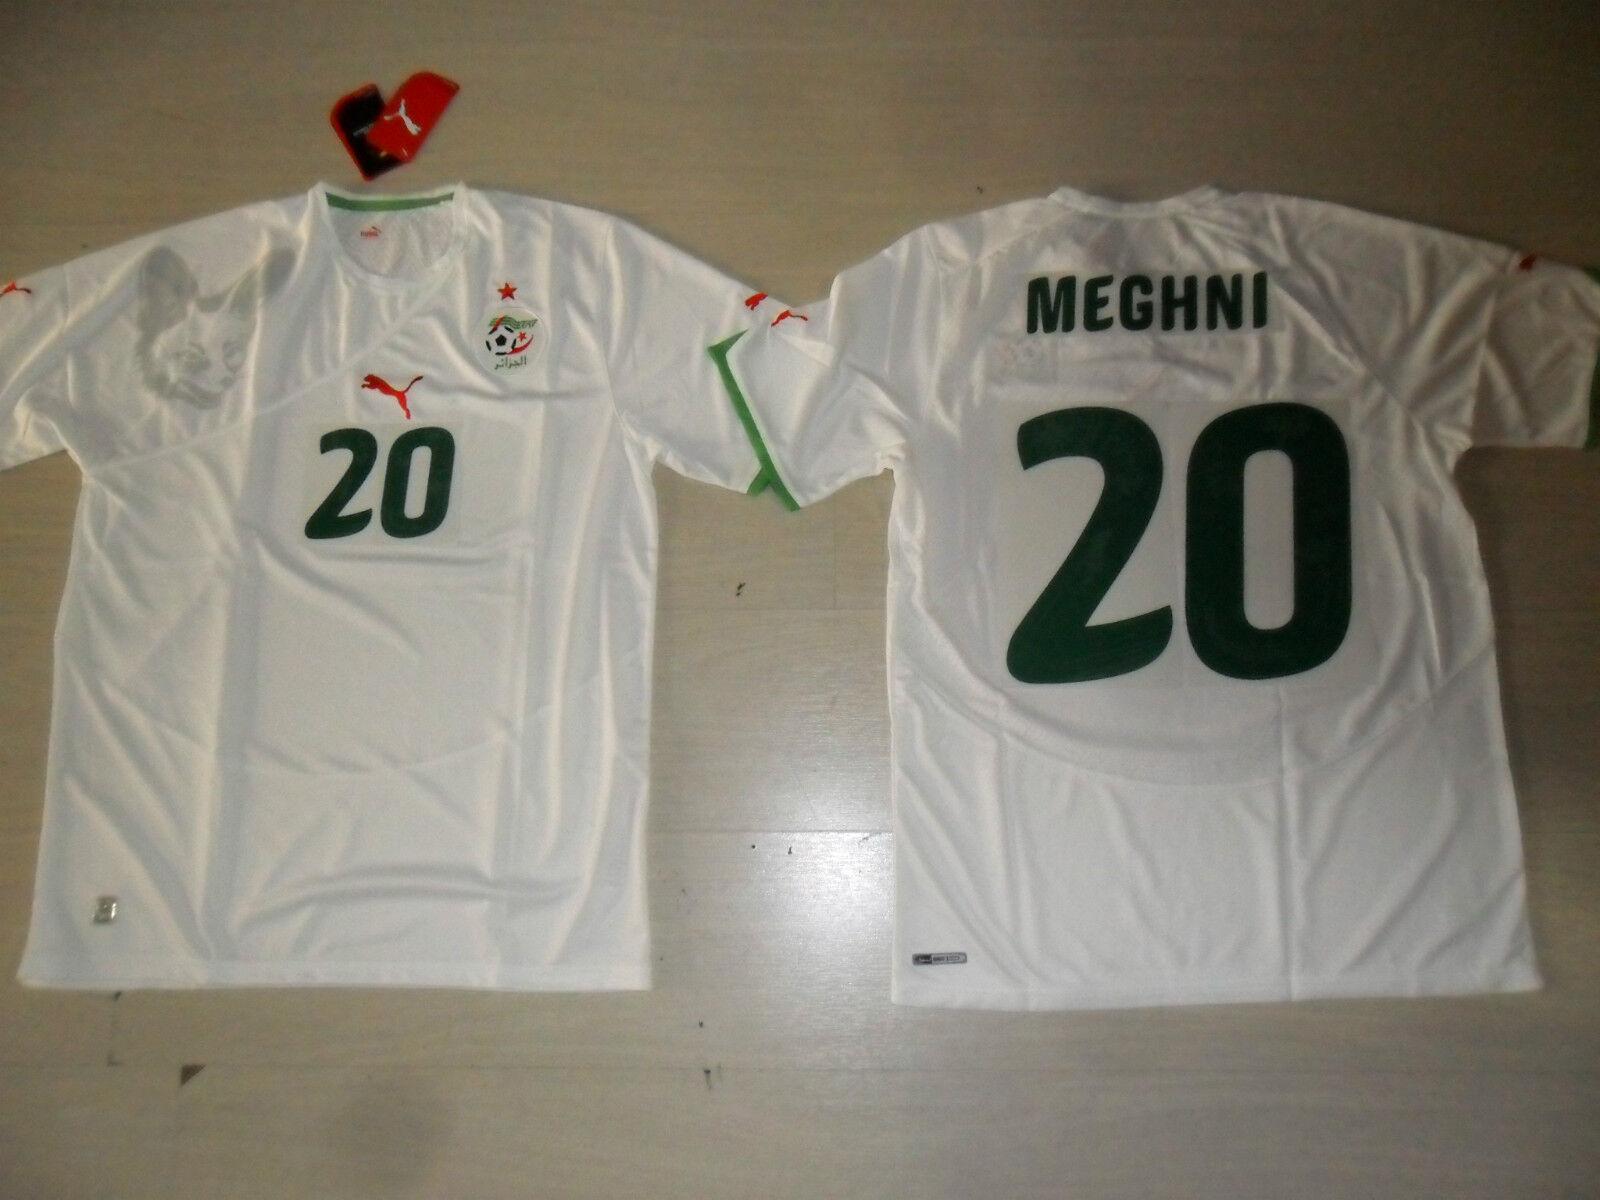 0299 TG XL MEGHNI 20 PUMA ALGERIA MAGLIA MAGLIETTA SHIRT JERSEY TRIKOT ALGÉRIE